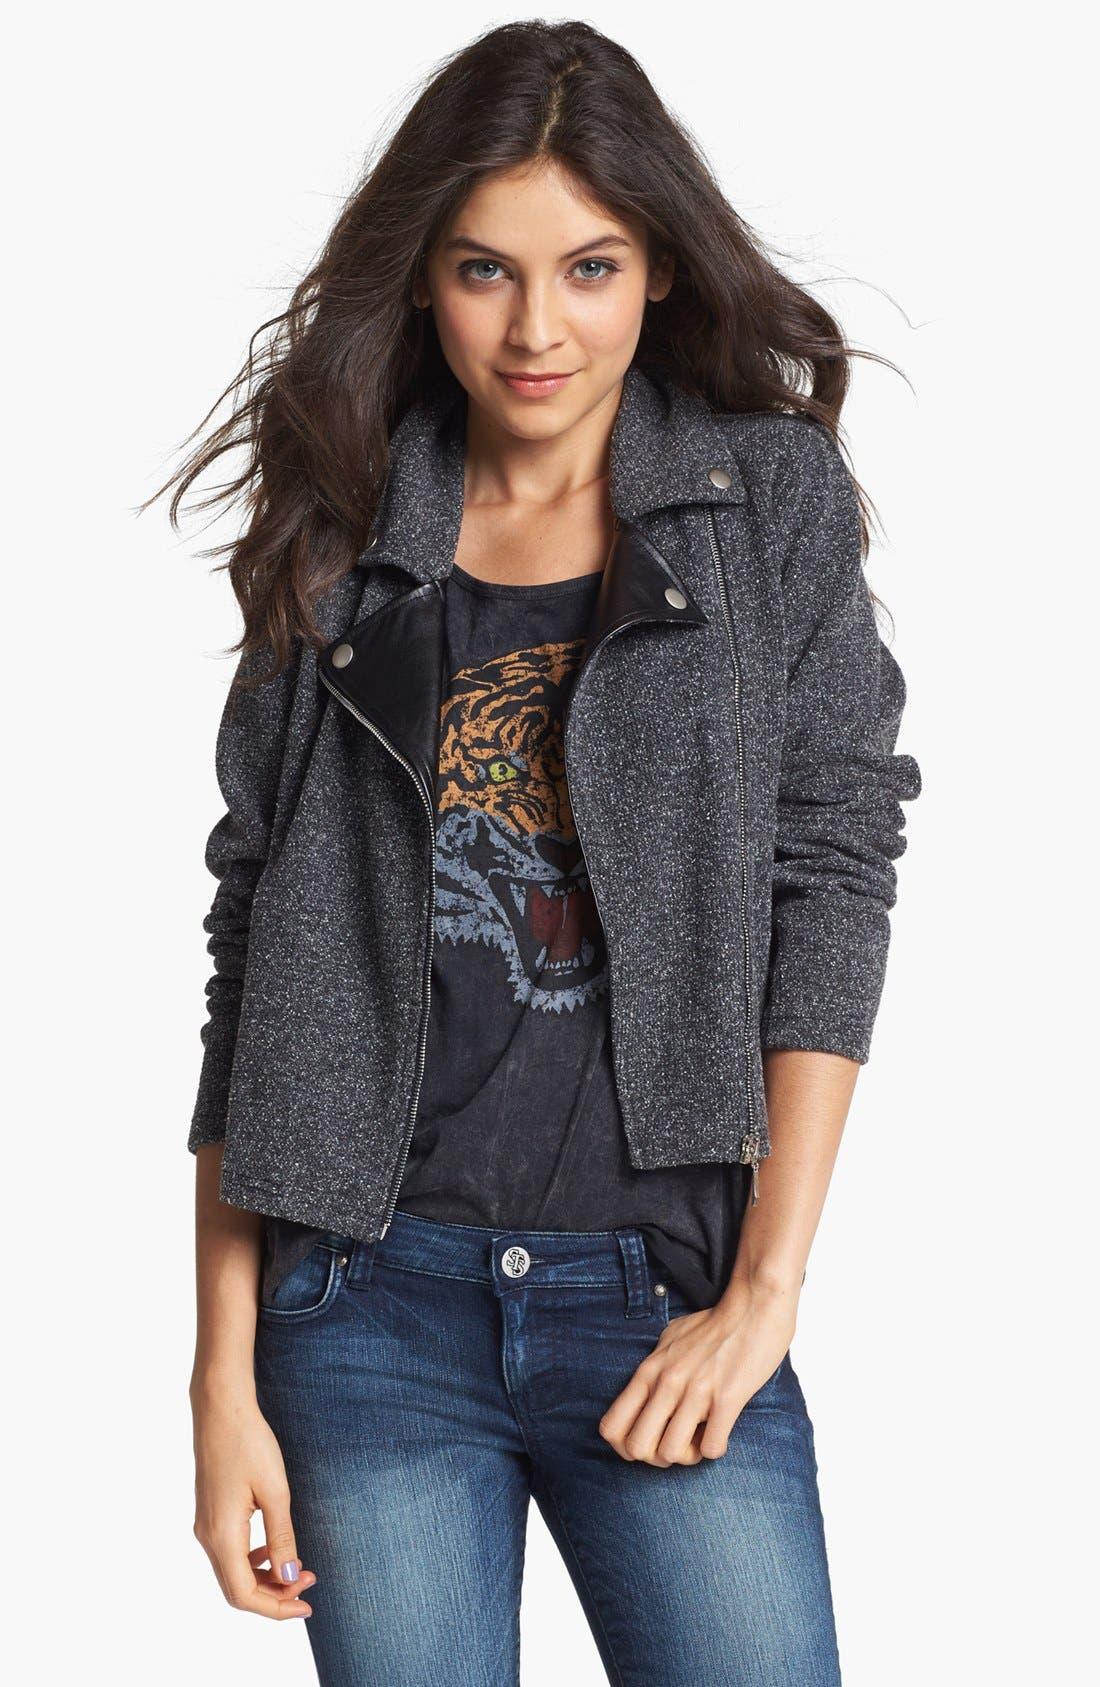 ORIGINAL FRENCHI Faux Leather Lapel Tweed Moto Jacket, Main, color, 001